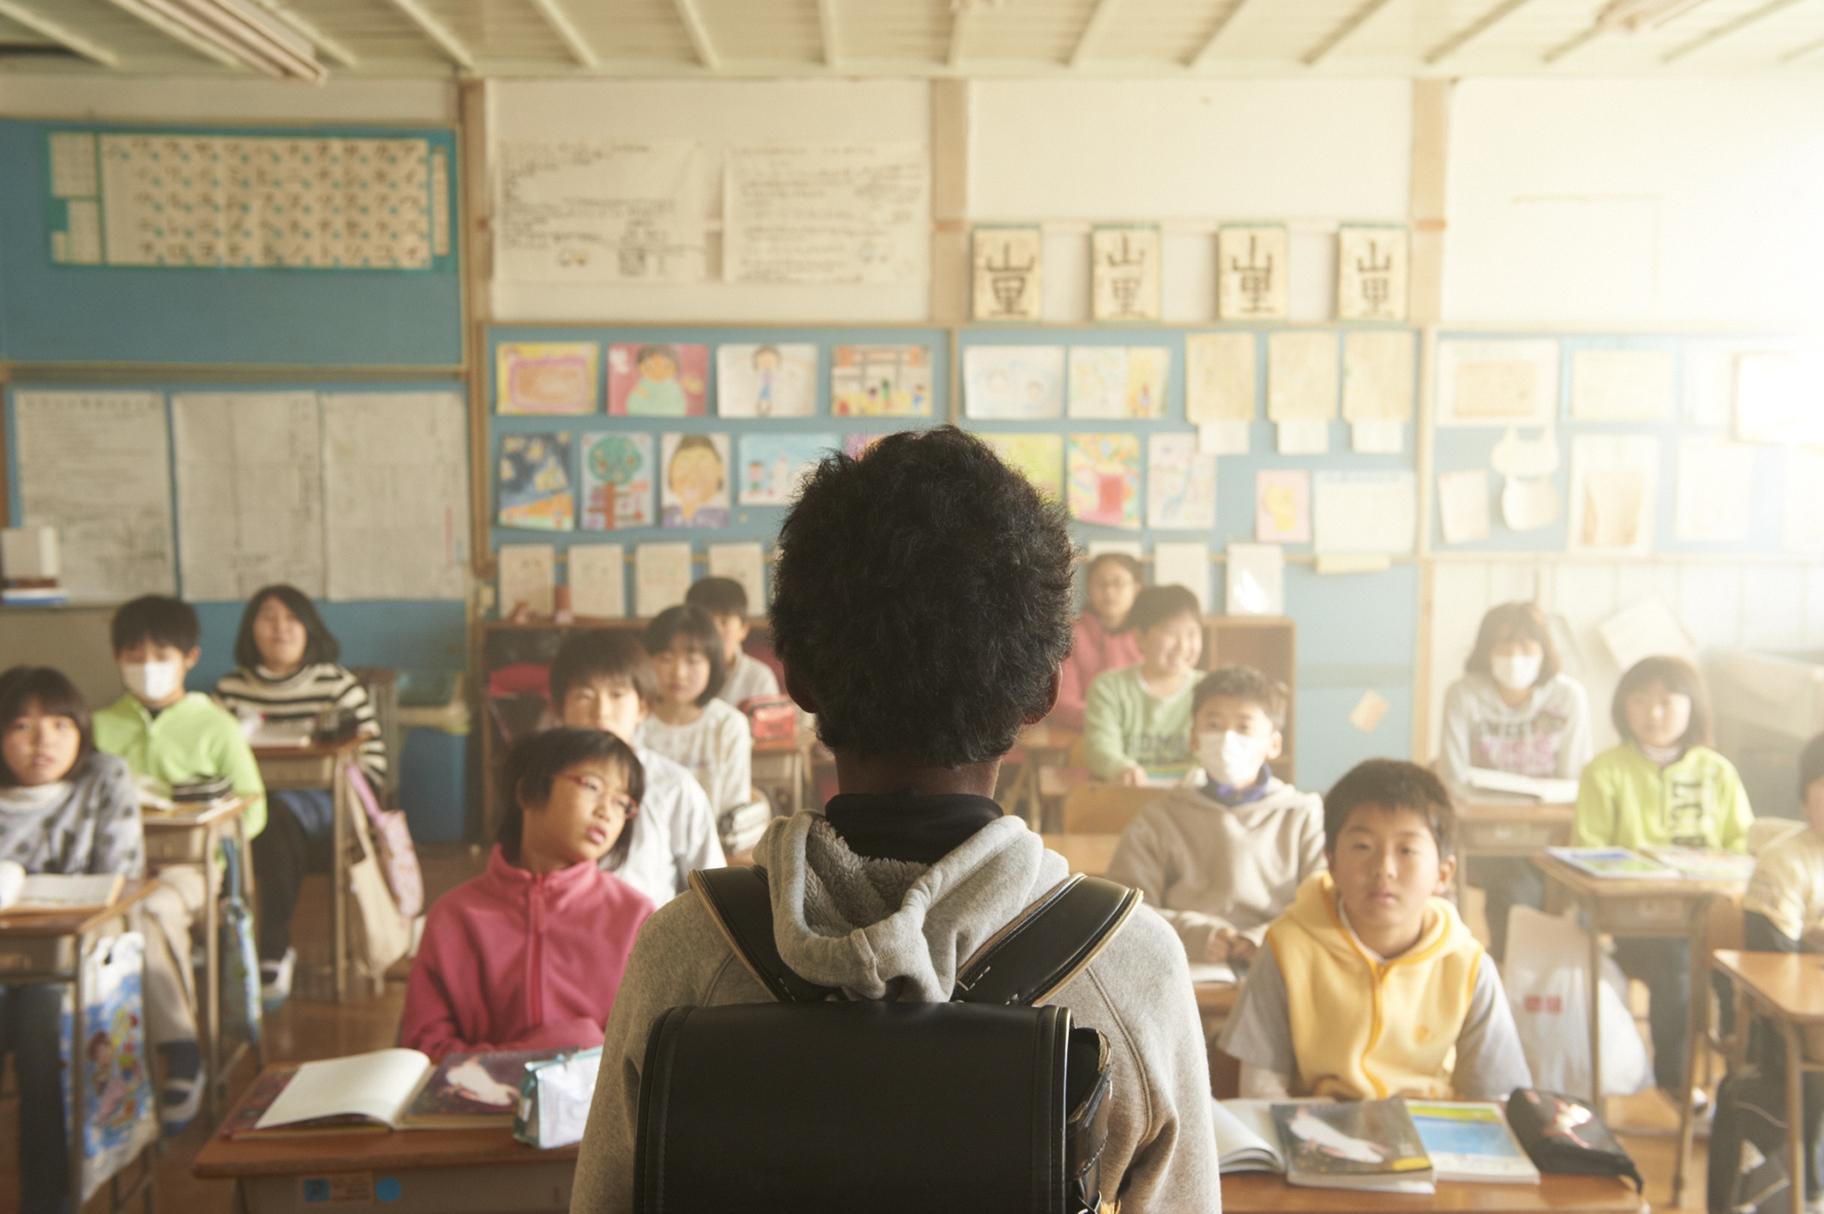 AT&T STUDENT FILM AWARD WINNER 'BORN WITH IT'